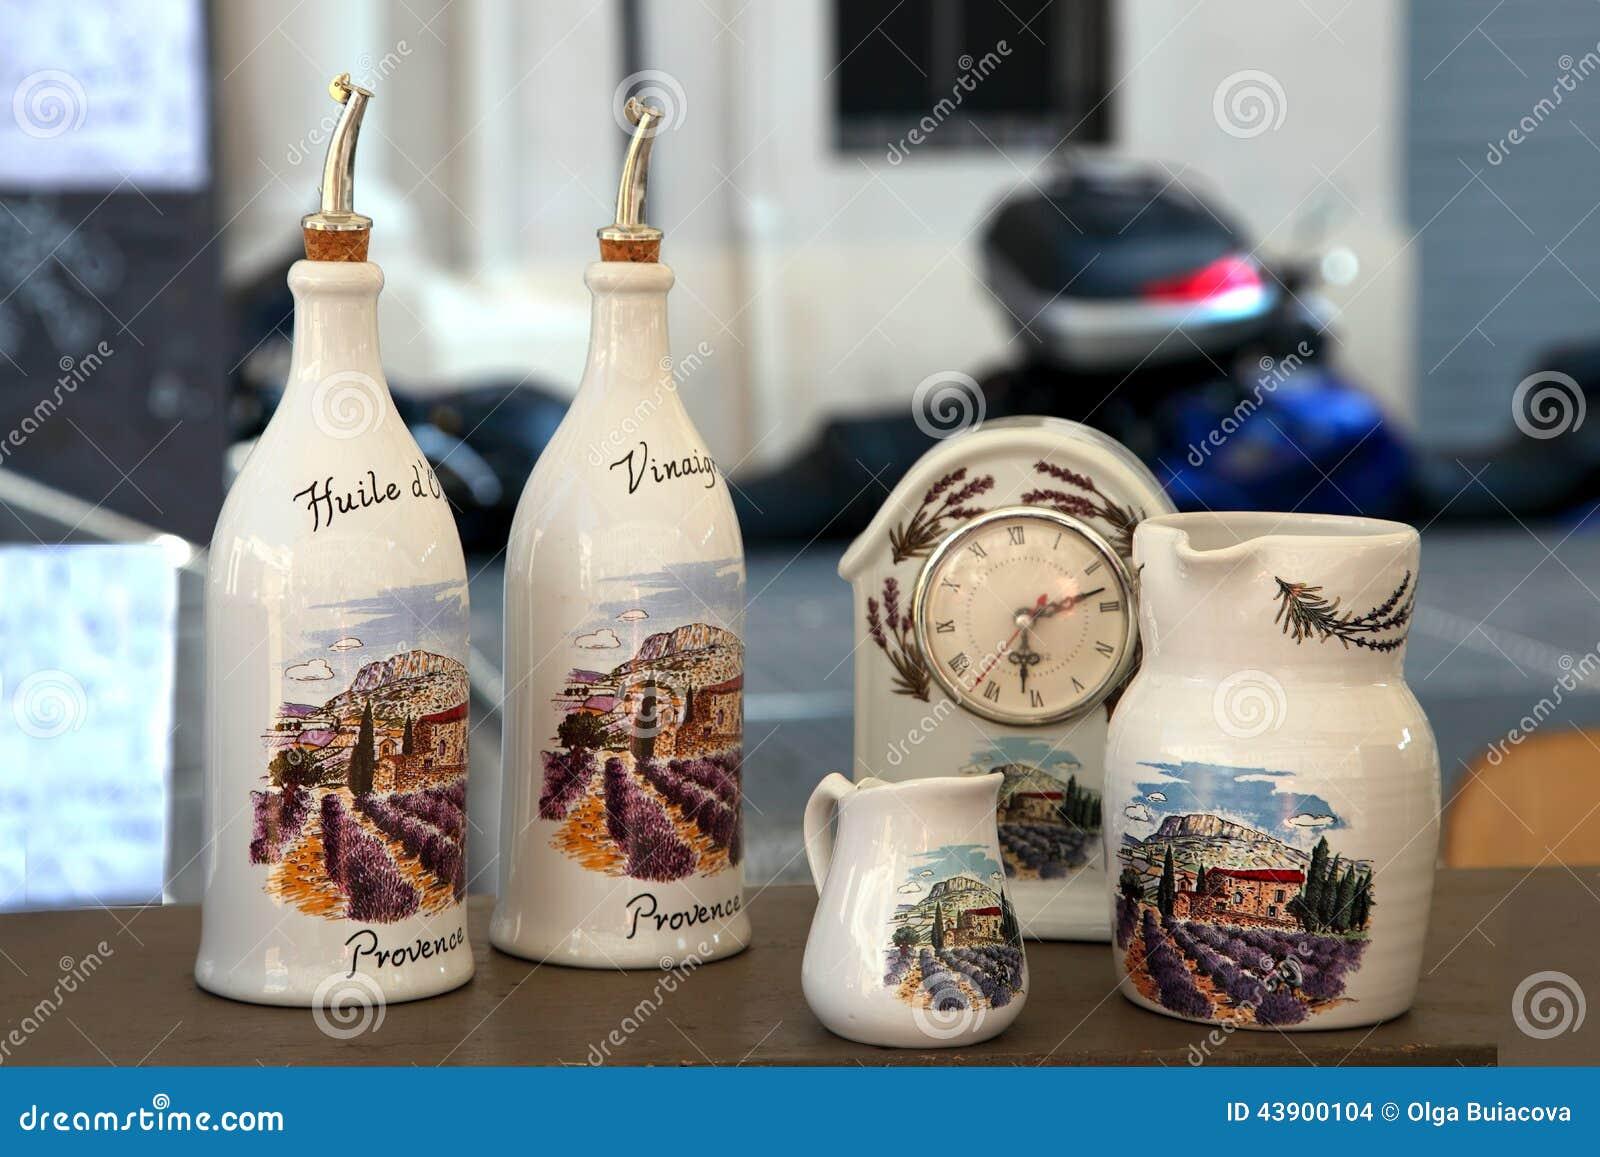 Marseille france circa july 2014 sale souvenir crockery in a marseille france circa july 2014 sale souvenir crockery in a publicscrutiny Images